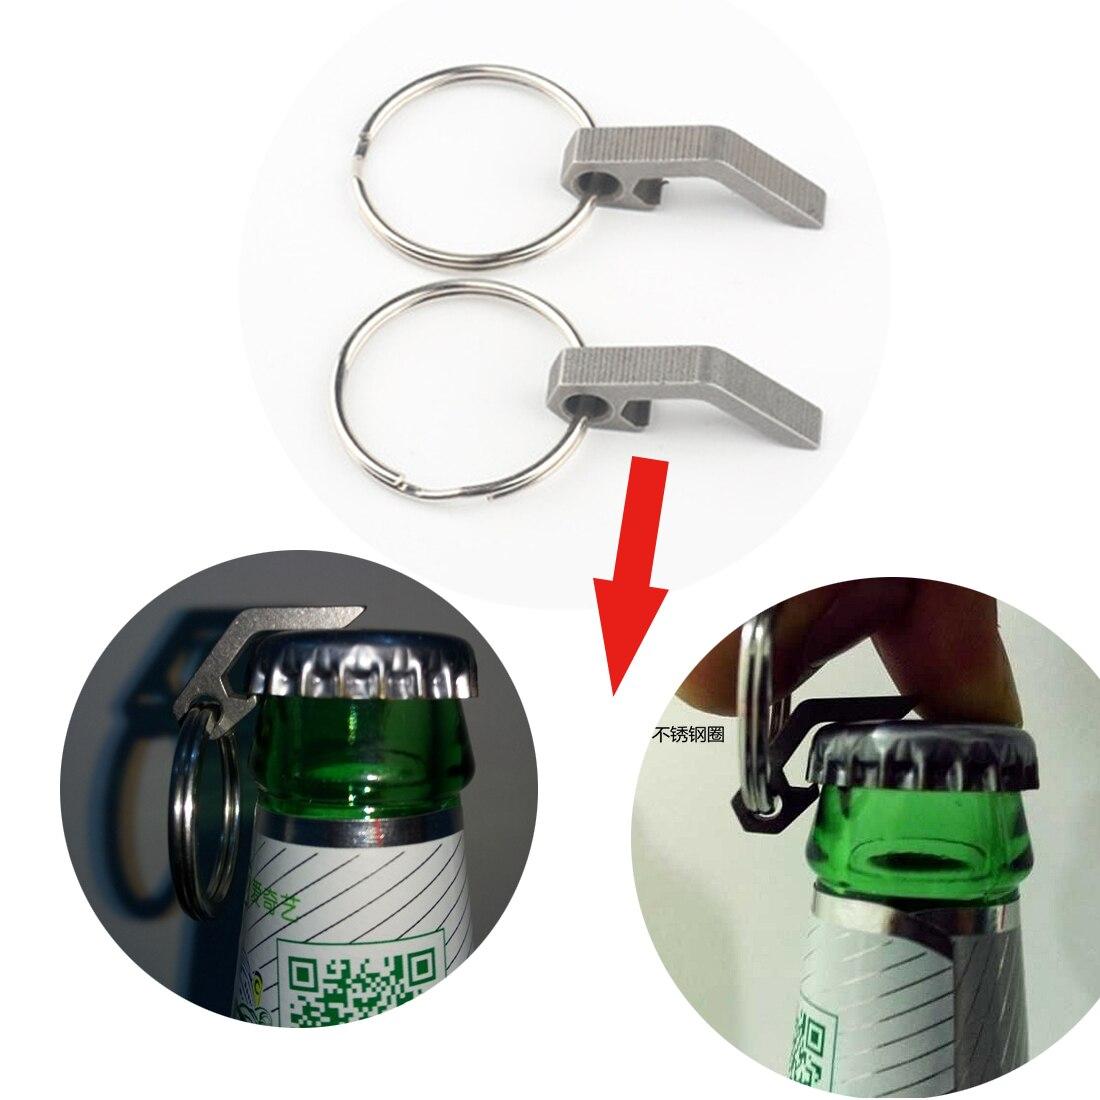 Herramientas útiles Engranaje al aire libre mini ligero botella de cerveza abrid